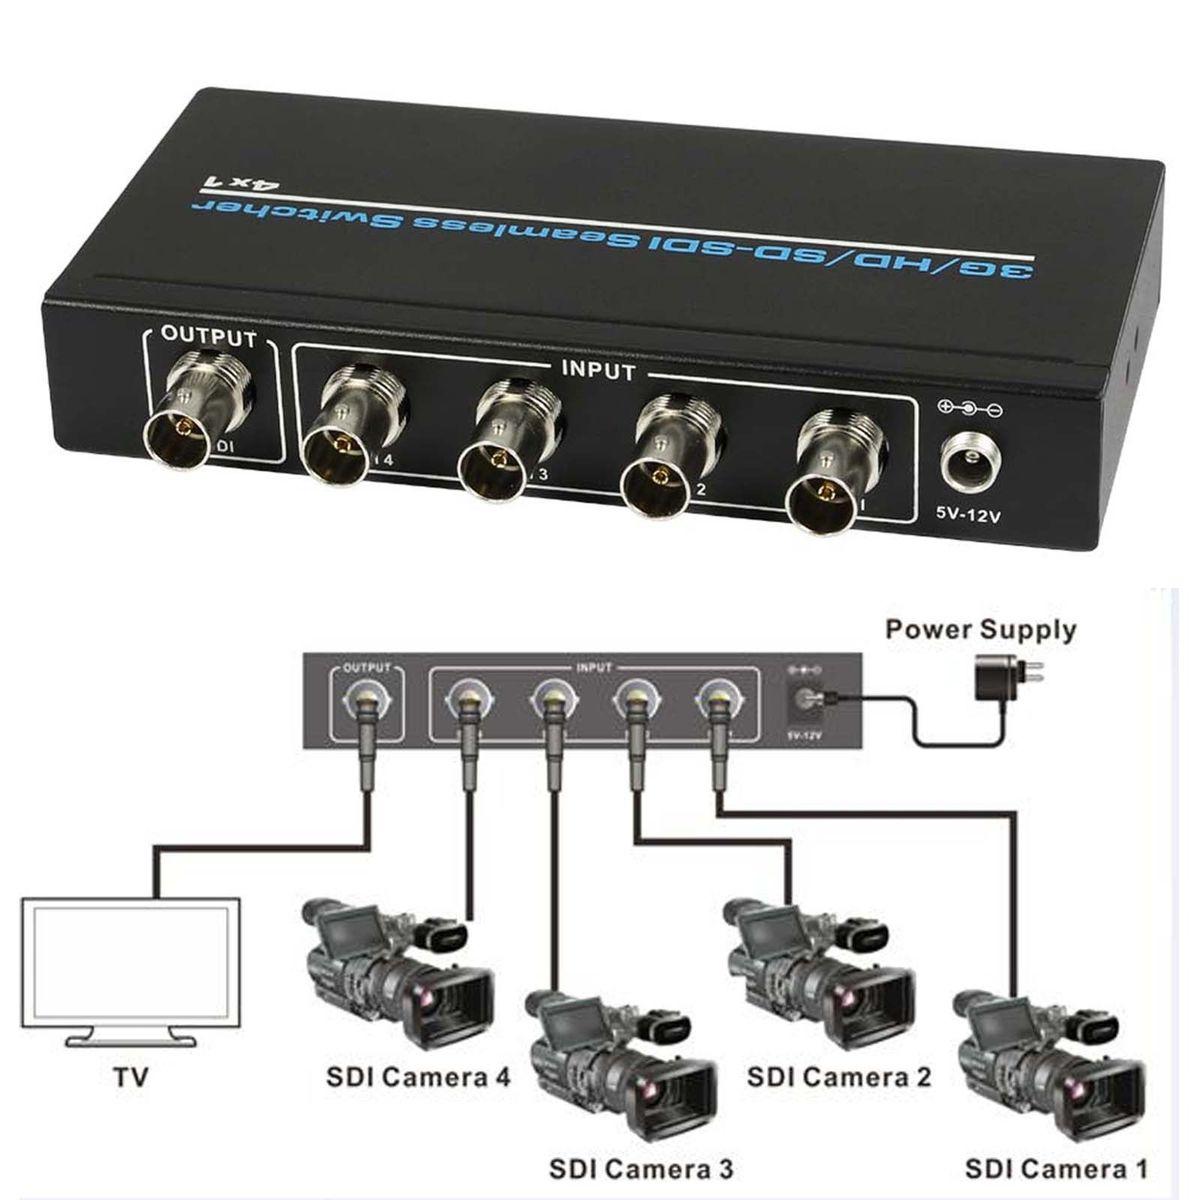 4 Port BNC SDI/HD-SDI/3G-SDI Seamless Switcher Scaling 4x1 Switch 1080P + IR Remote Control Lossless over long distances 100m4 Port BNC SDI/HD-SDI/3G-SDI Seamless Switcher Scaling 4x1 Switch 1080P + IR Remote Control Lossless over long distances 100m